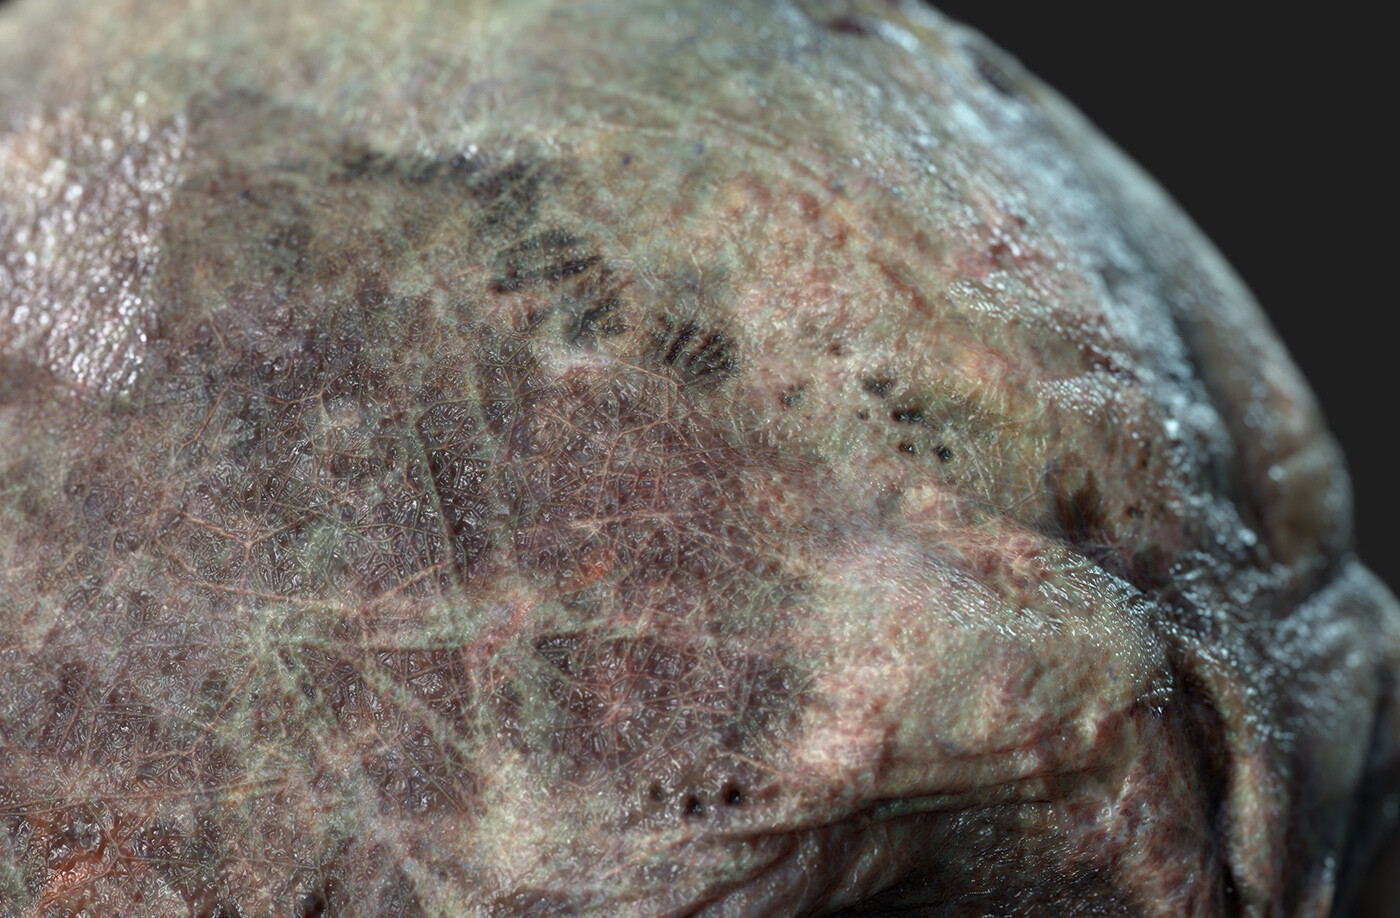 Zombie Skin micro detail closeup 4